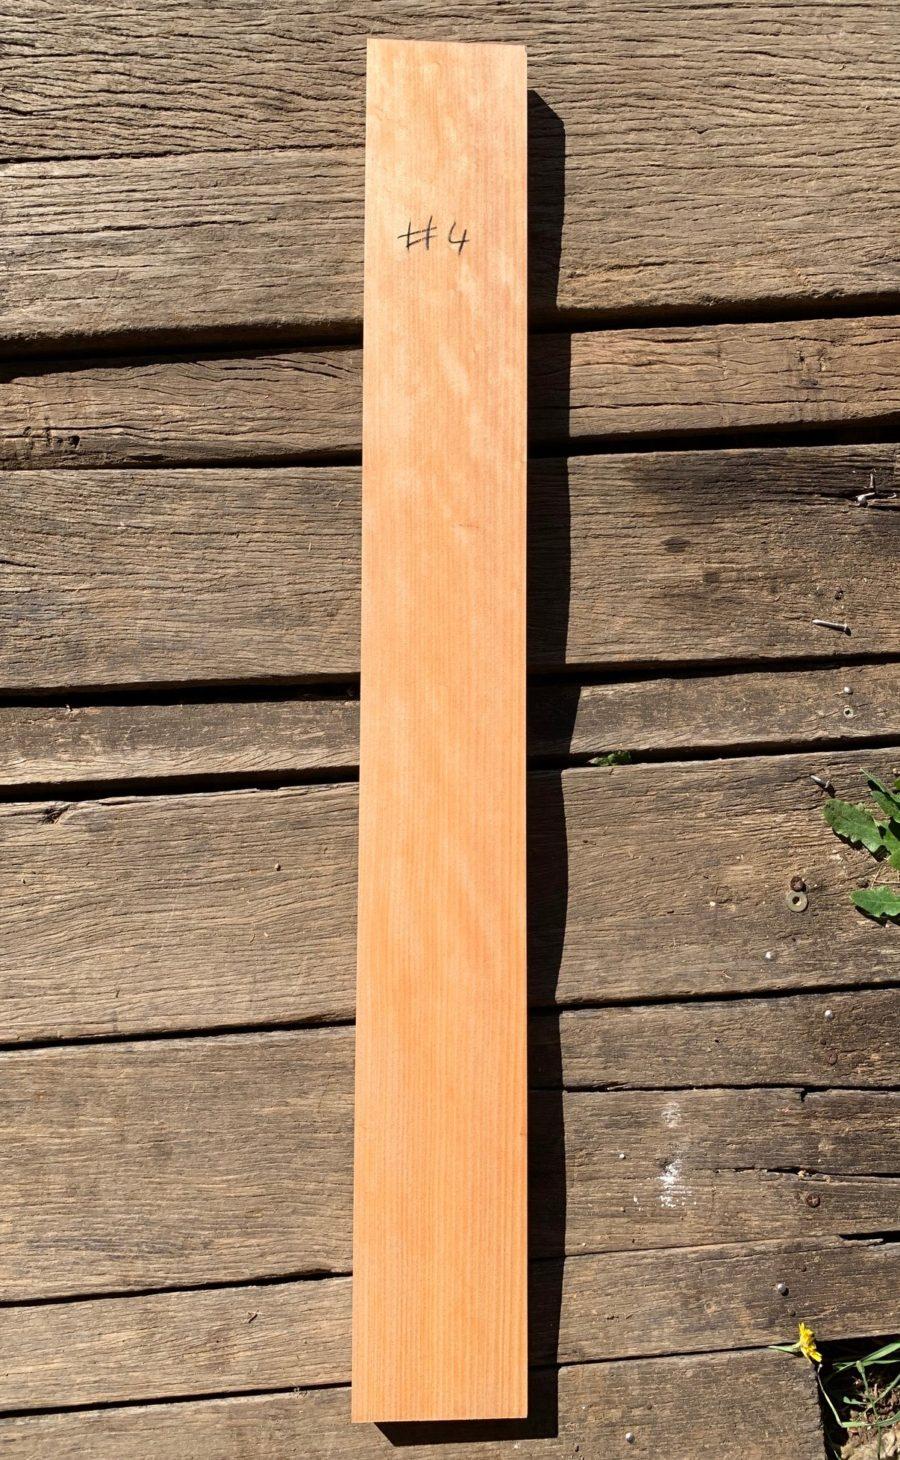 Quarter sawn tonewood